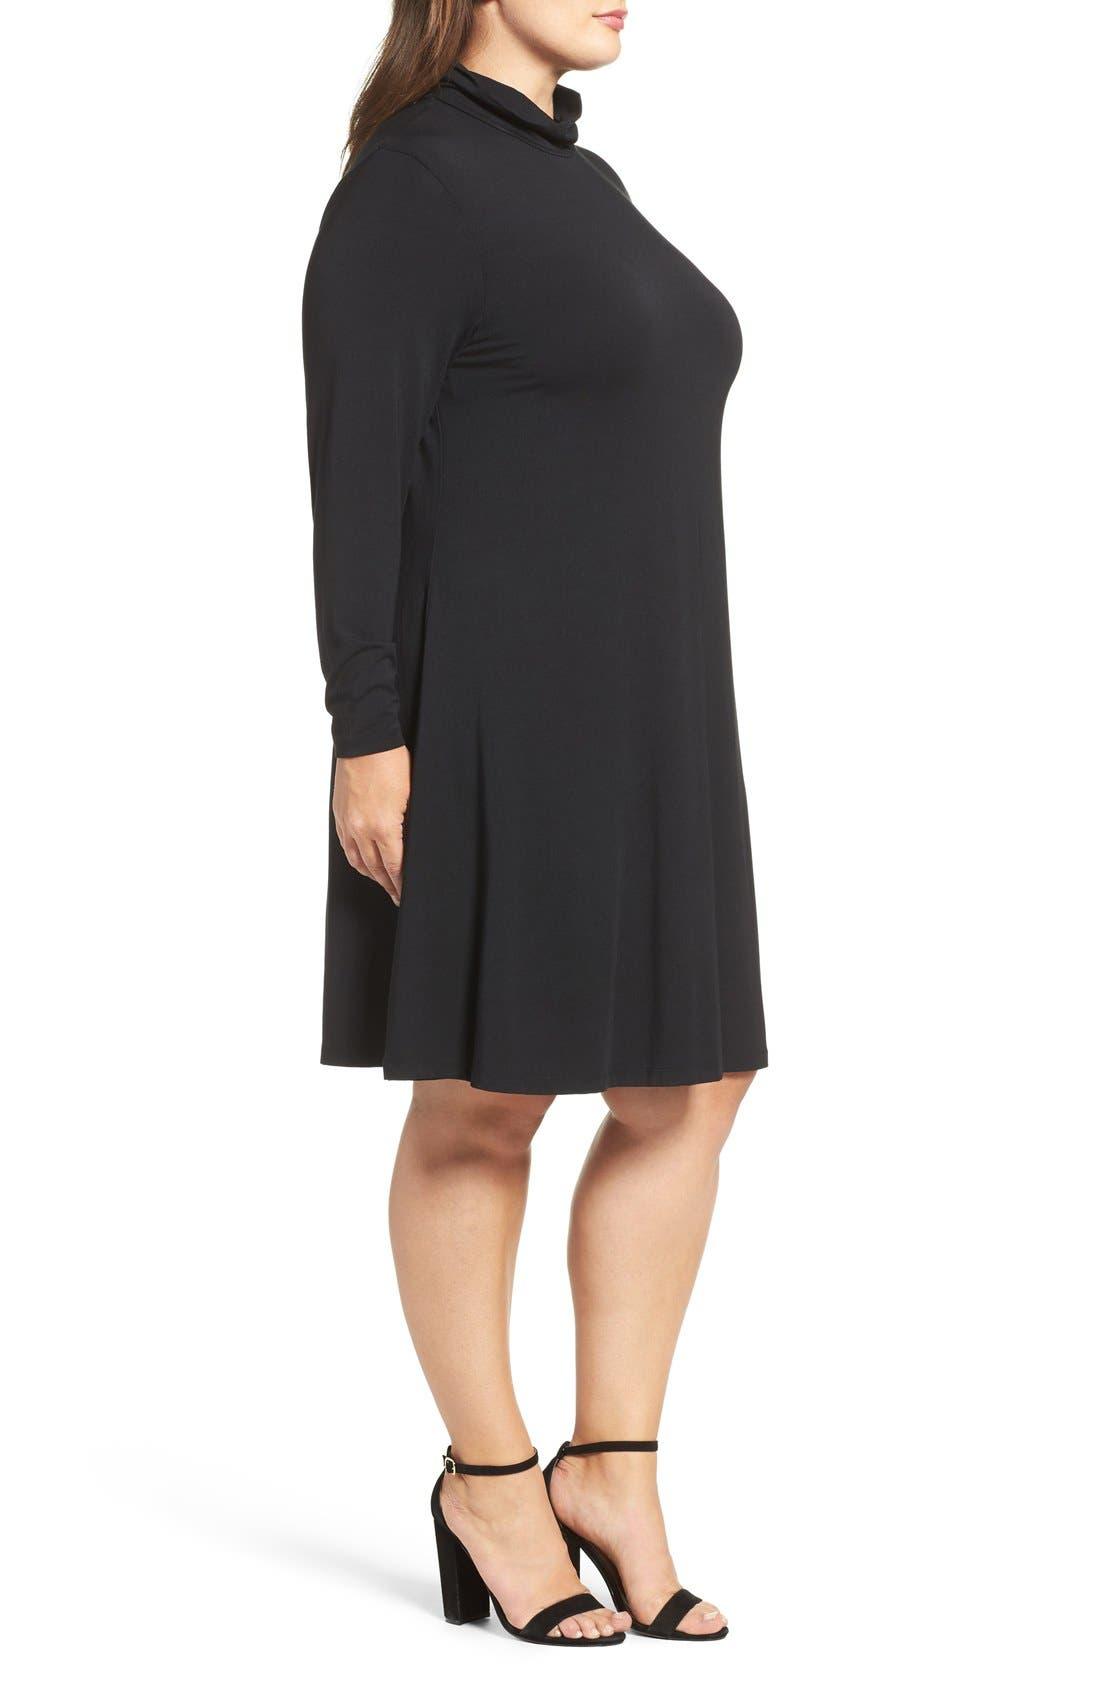 Sally Turtleneck A-Line Dress,                             Alternate thumbnail 8, color,                             001